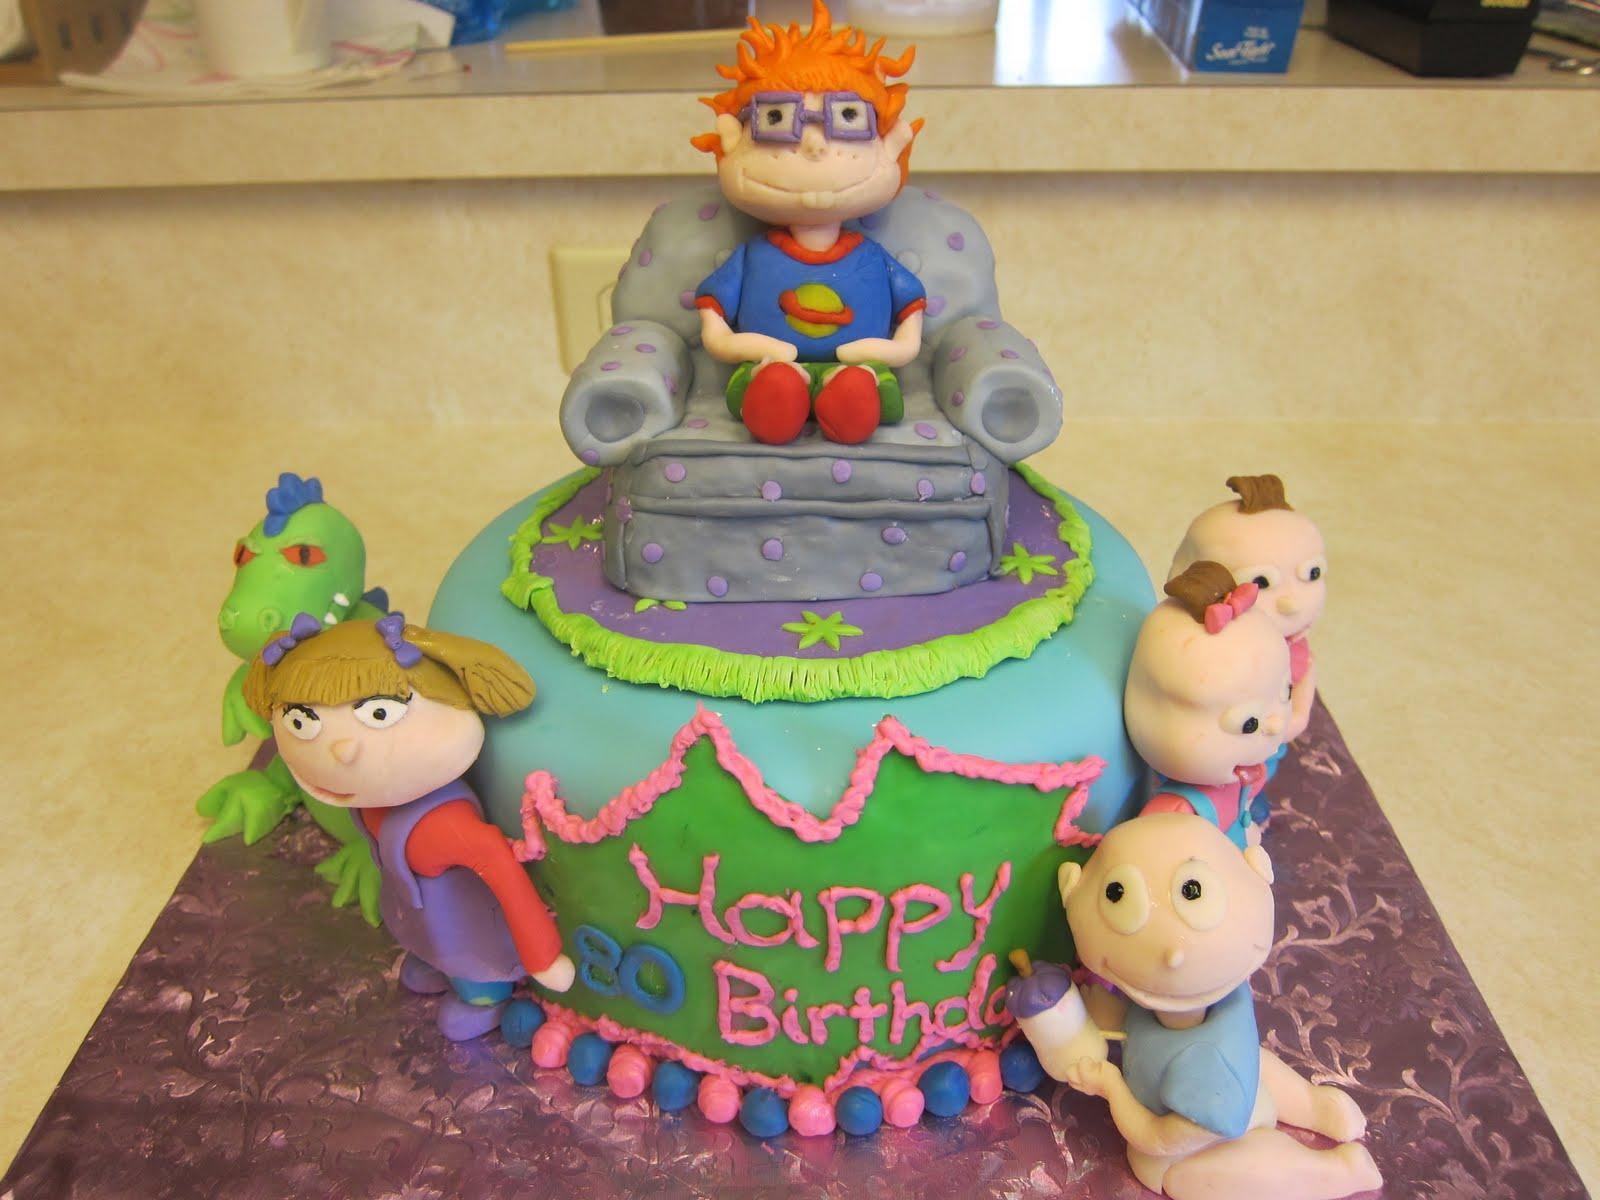 Terrific Rugrats Birthday Cake Picture Rugrats Birthday Cake Wallpaper Funny Birthday Cards Online Necthendildamsfinfo